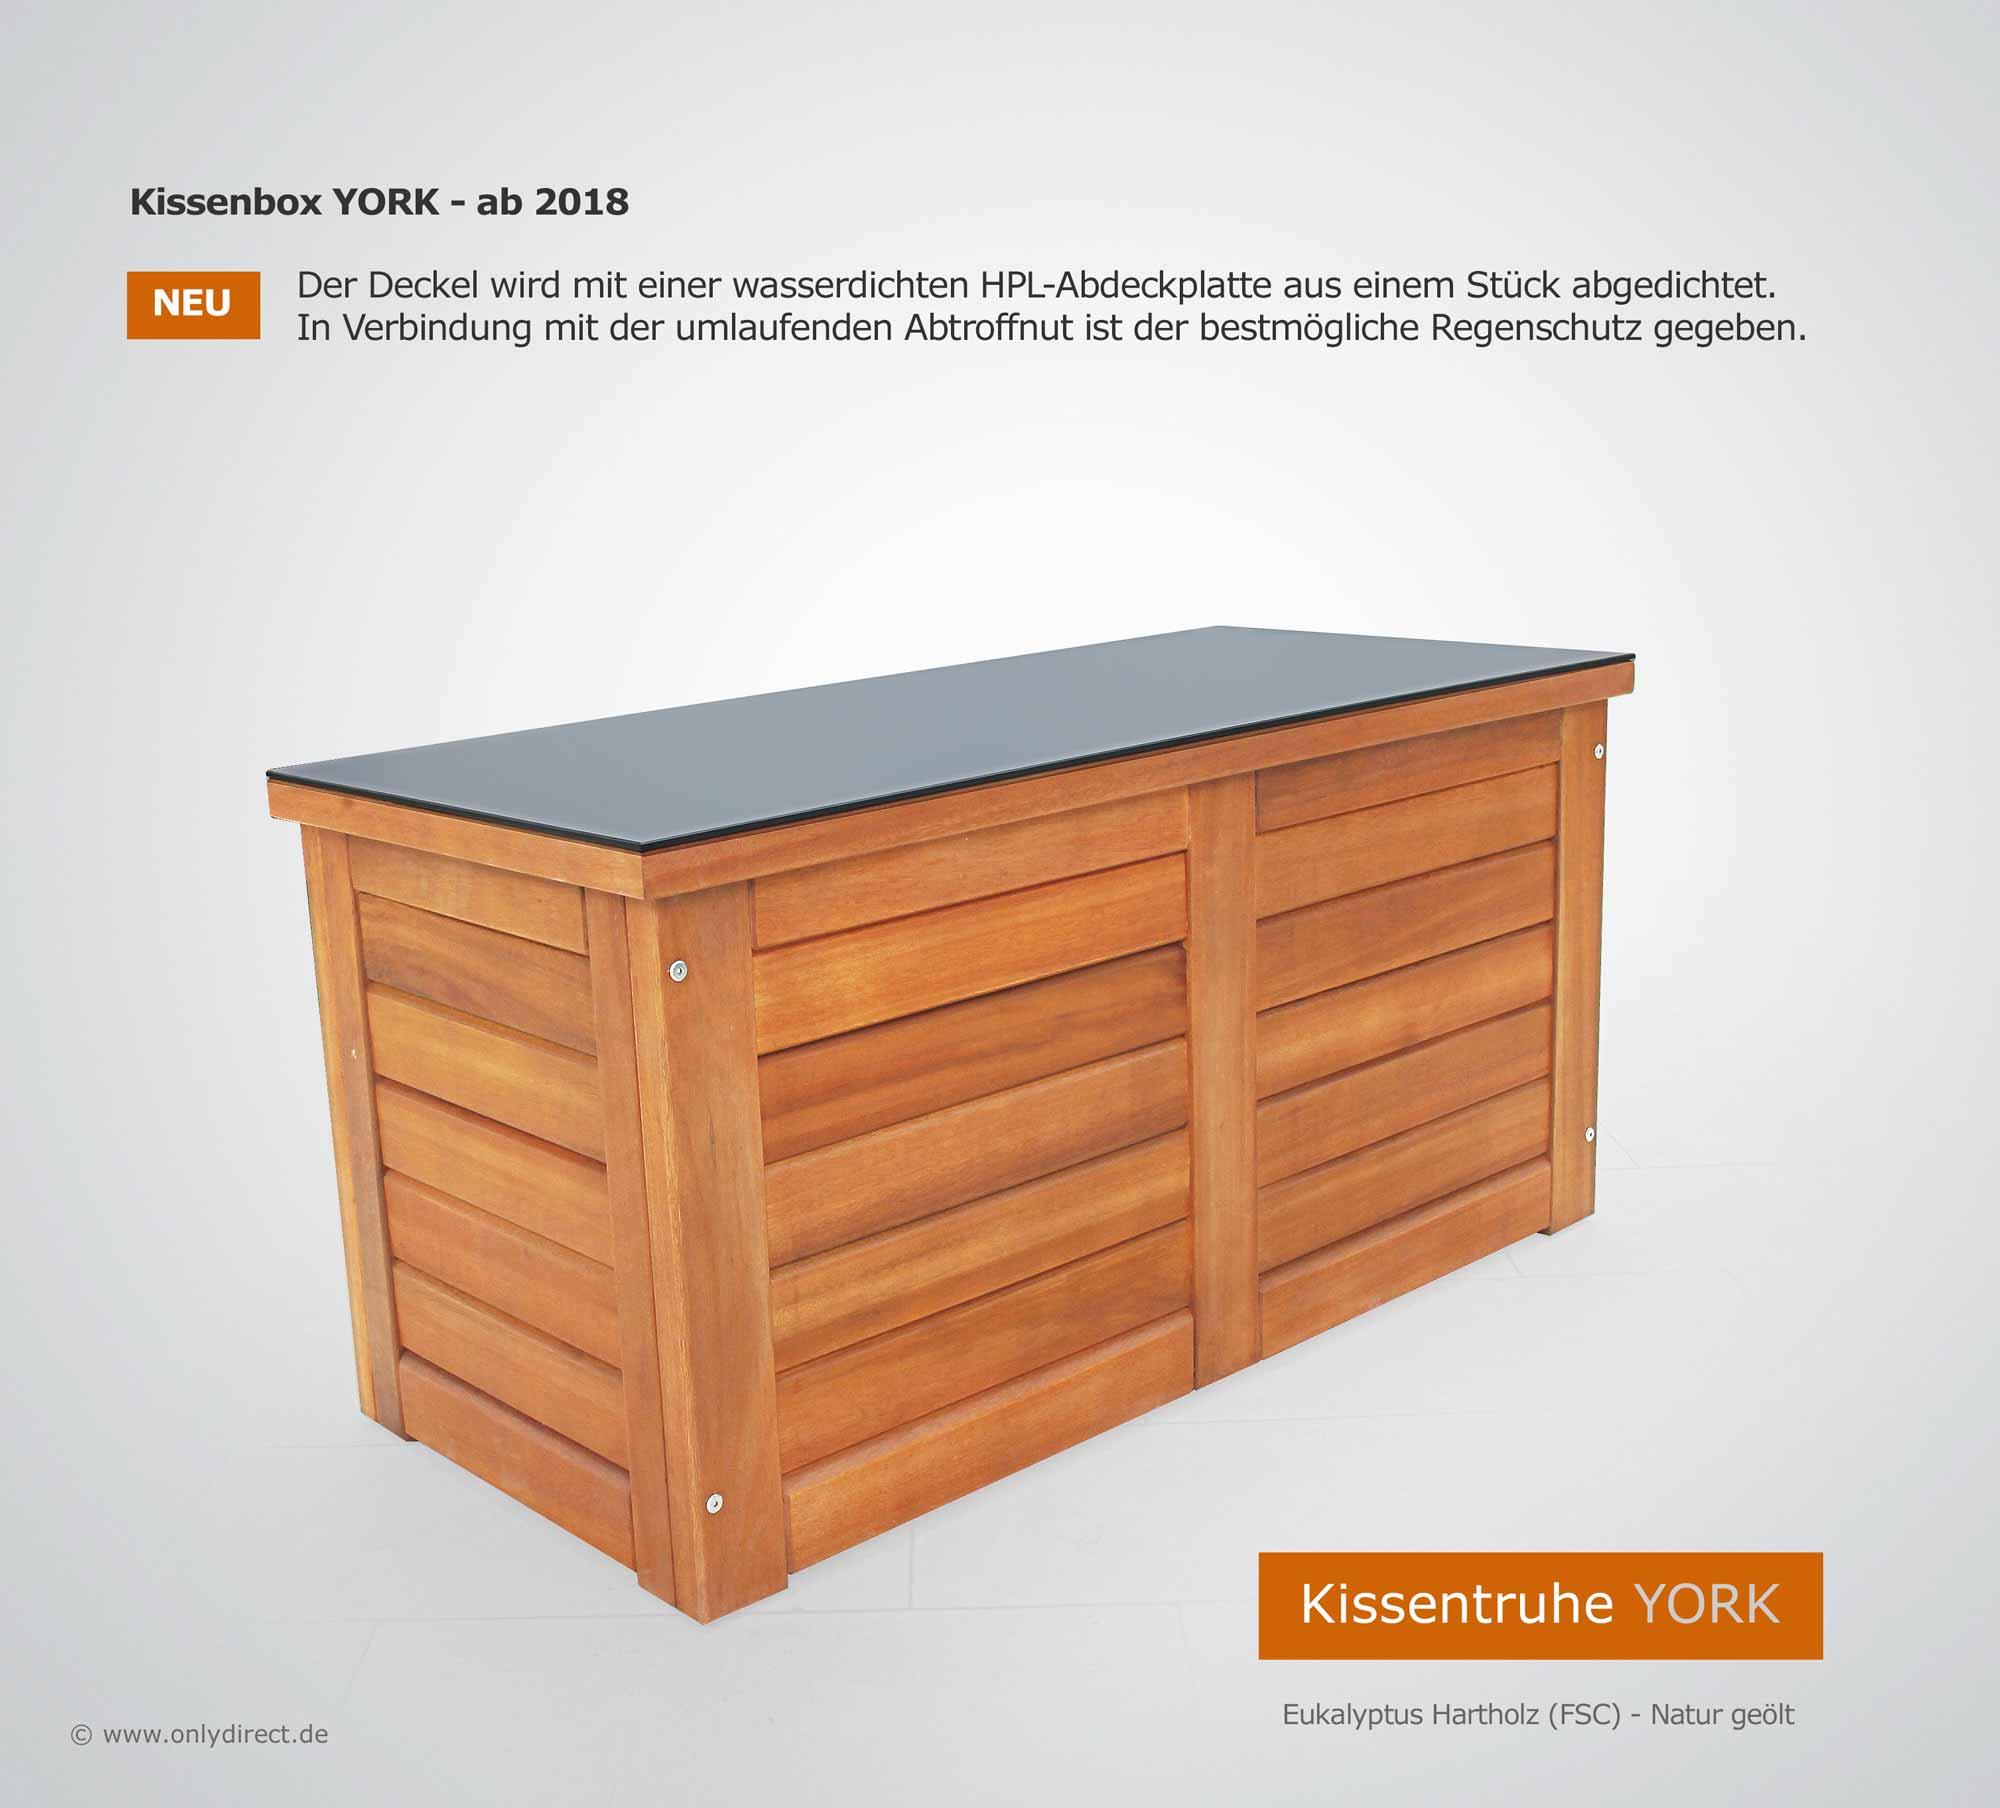 friesenbank shop premium auflagenbox gartenbox holz kissenbox box f r kissen. Black Bedroom Furniture Sets. Home Design Ideas